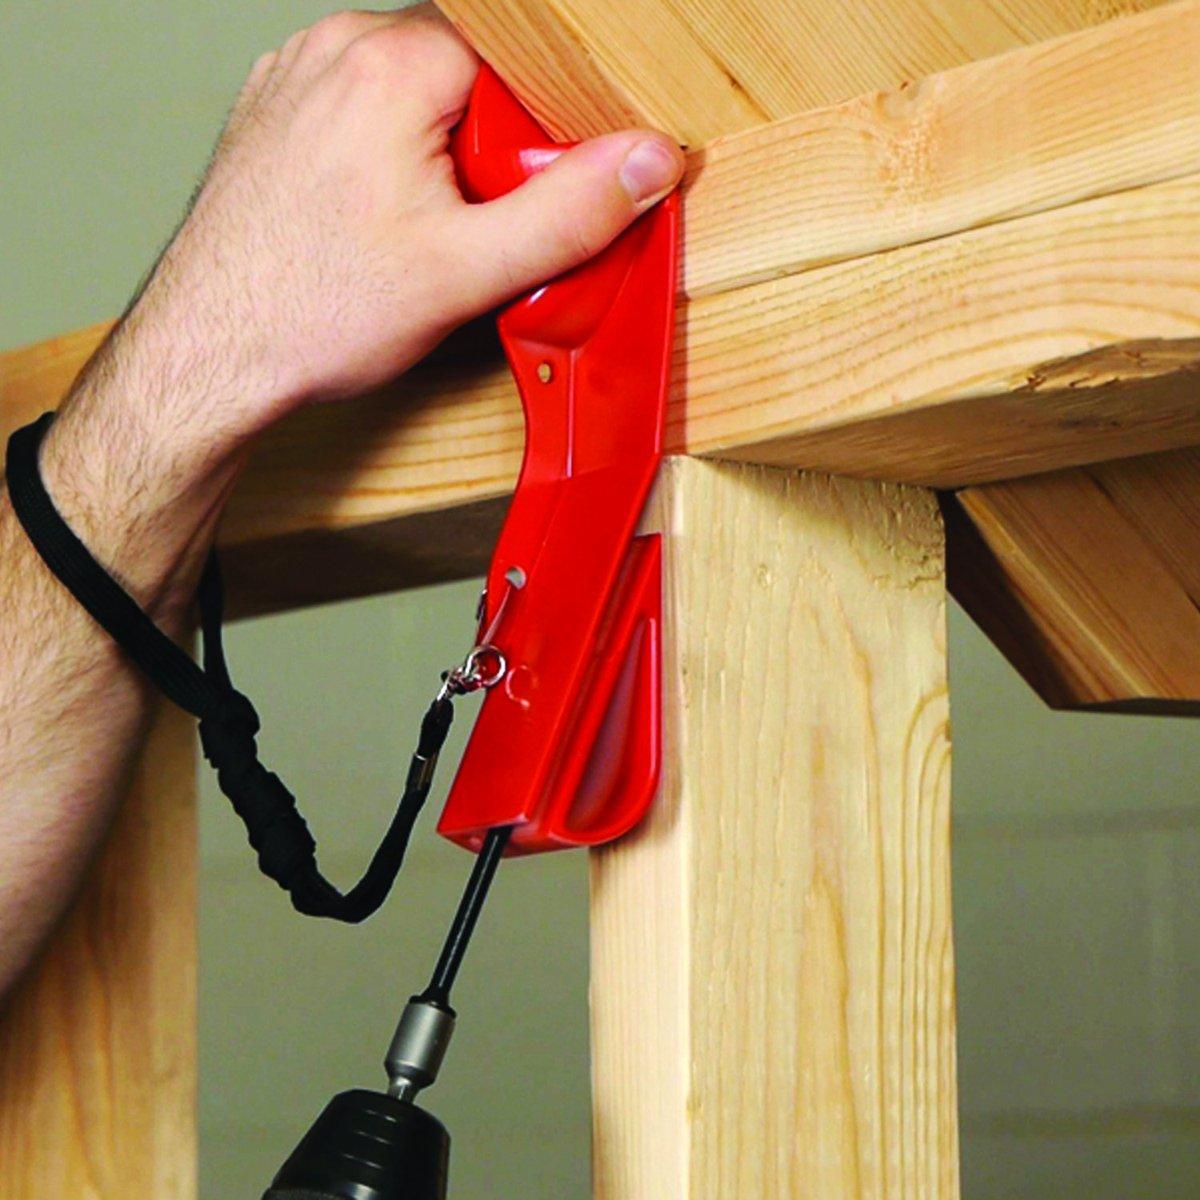 Fastenmaster timberlok rafter truss to top plate installation.